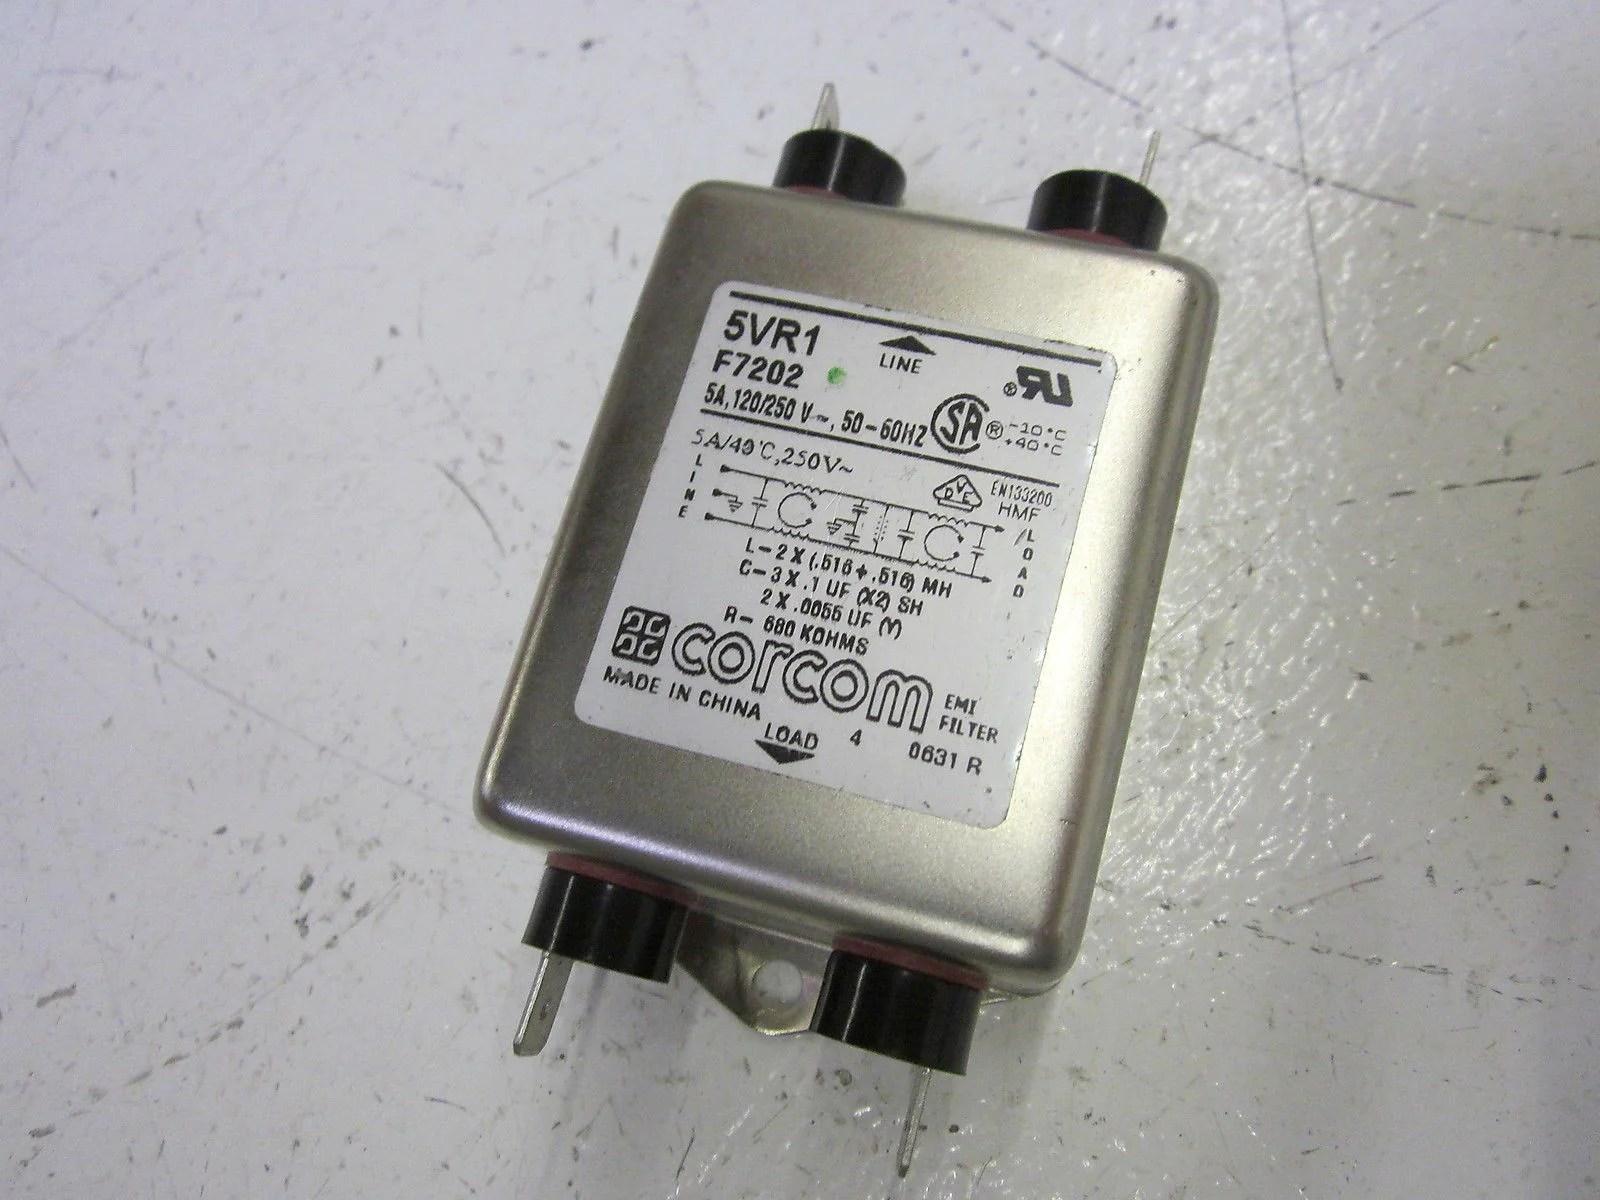 CORCOM 5VR1 F7202 EMI FILTER 120/250V *USED* – MRO Global Solutions